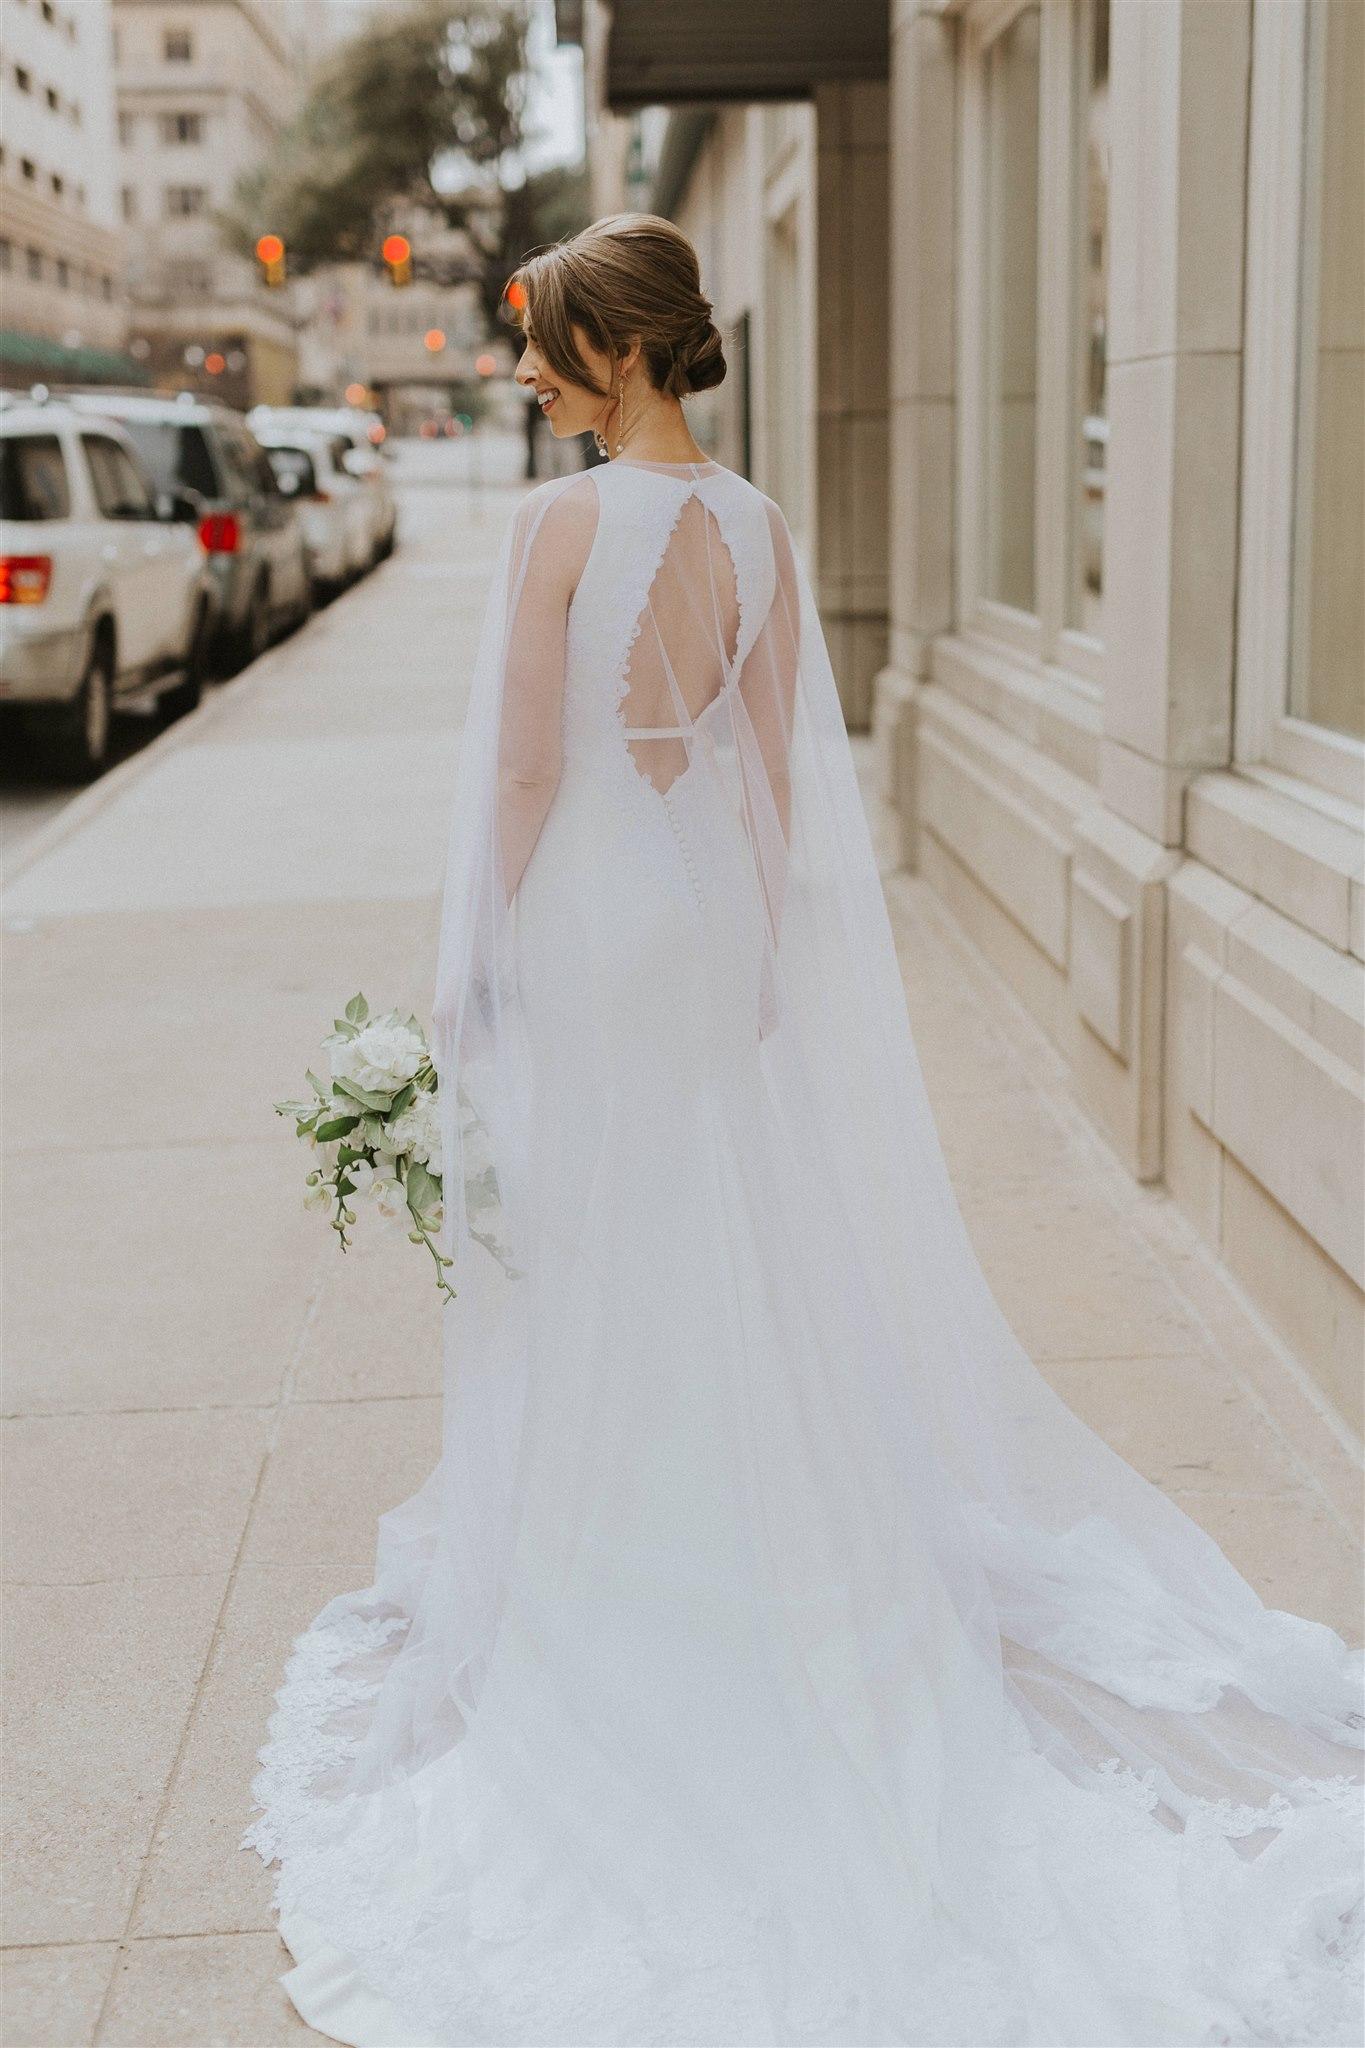 Katy-Beth-and-Ryan-For-Worth-Wedding-HauserPhotography-797.jpg